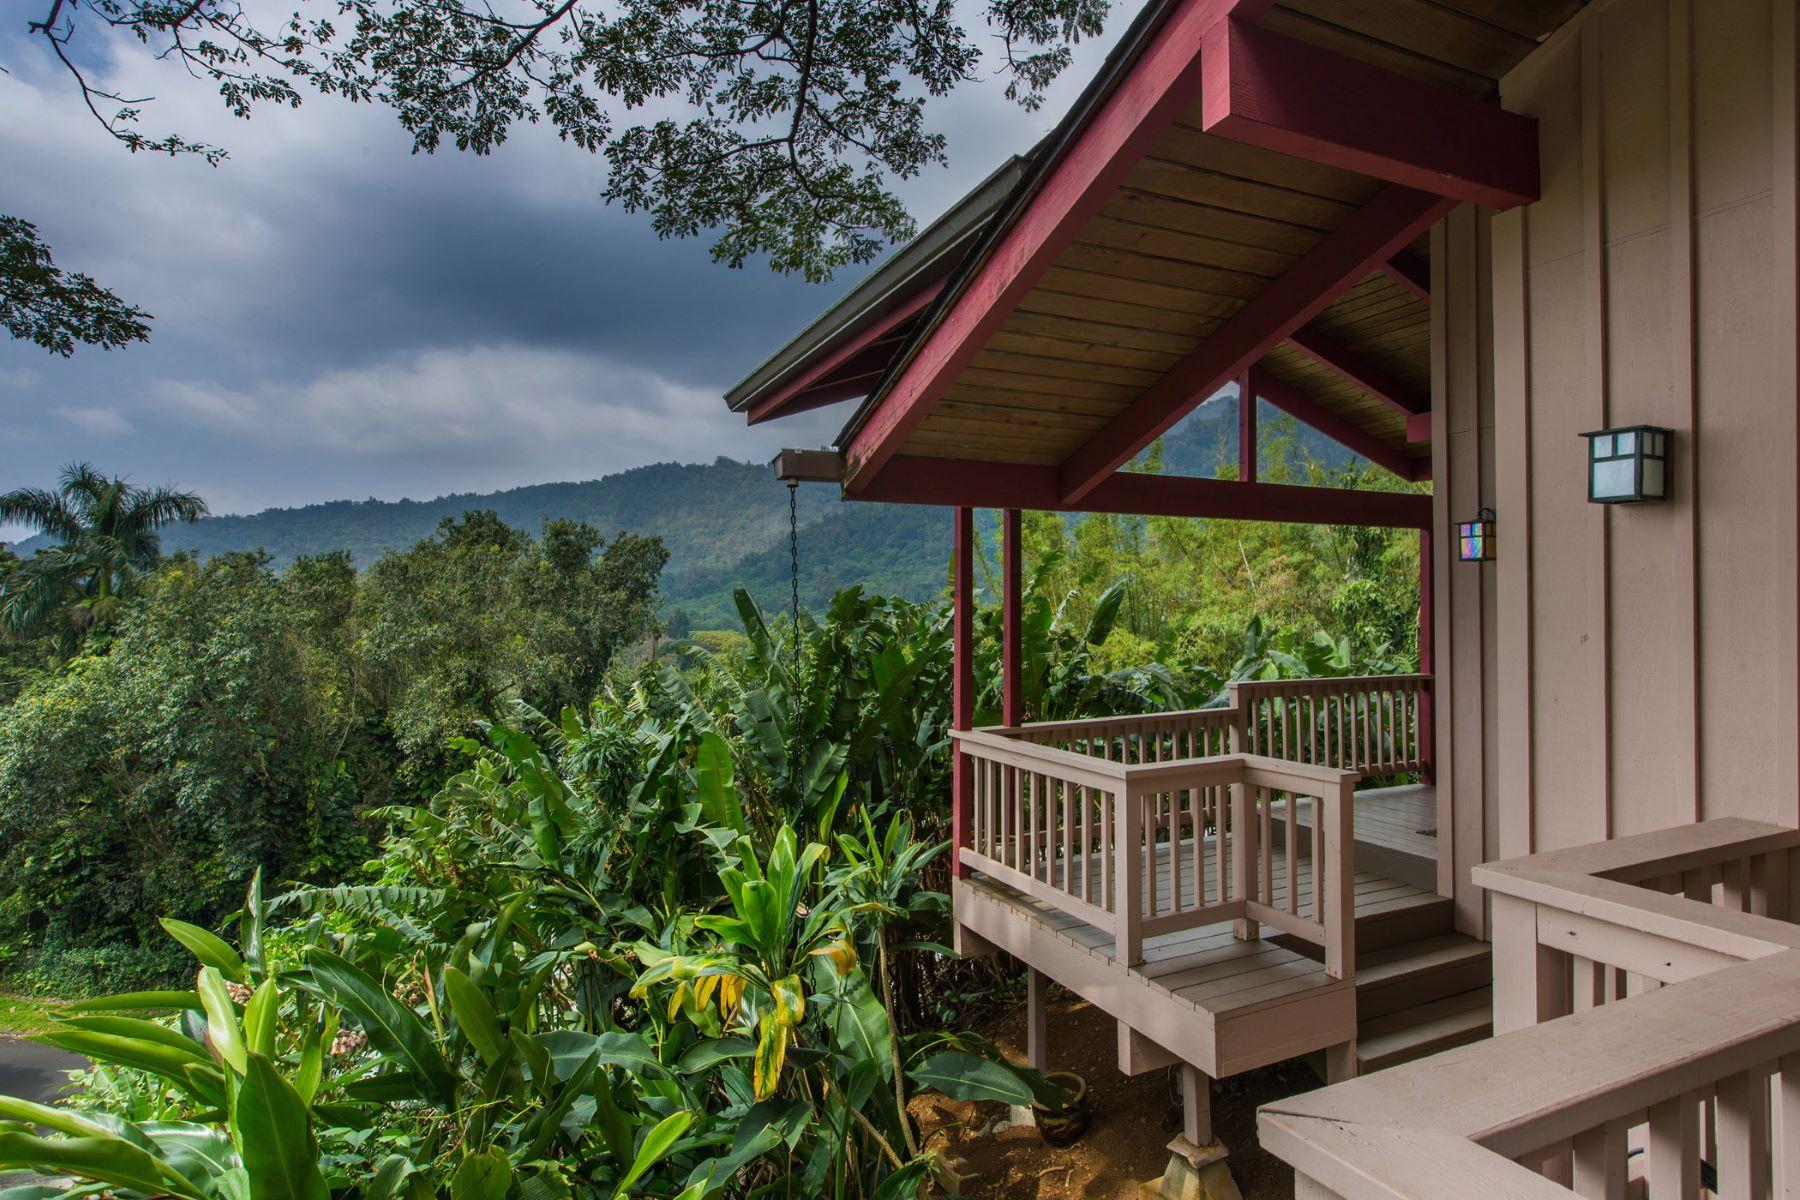 Single Family Home for Sale at Peaceful Rainforest Tree House 3155 Kaohinani Drive Honolulu, Hawaii 96817 United States